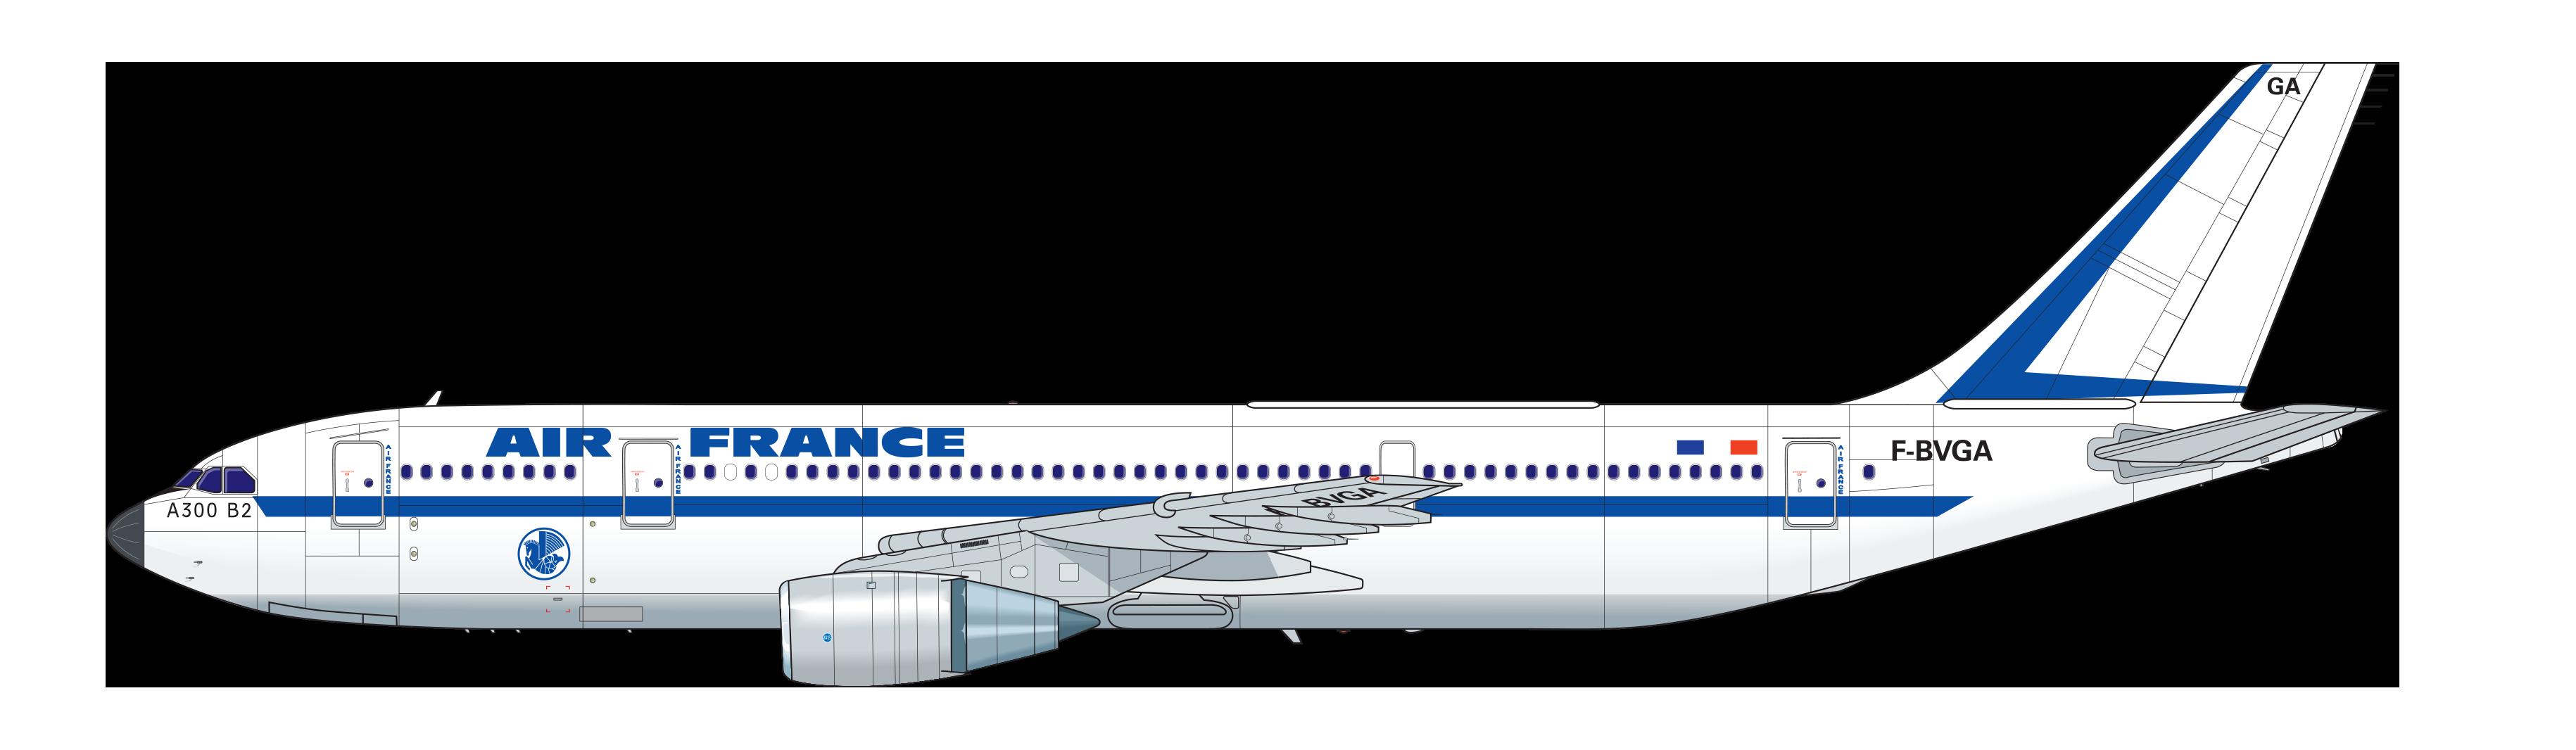 A300B2_AF_F-BVGA_.png